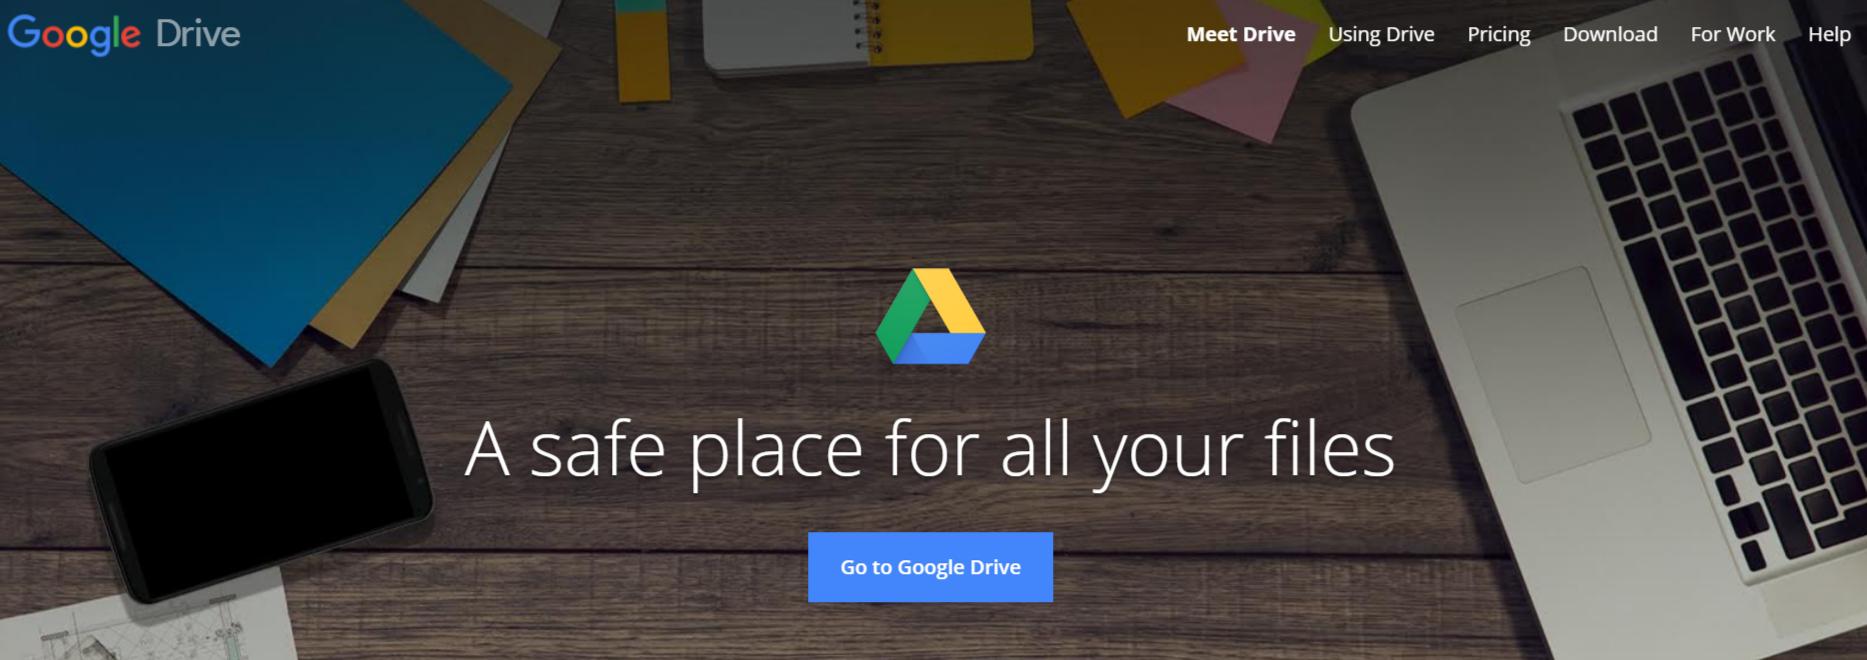 Google Drive Cloud Storage - Online Storage For Photos & Videos